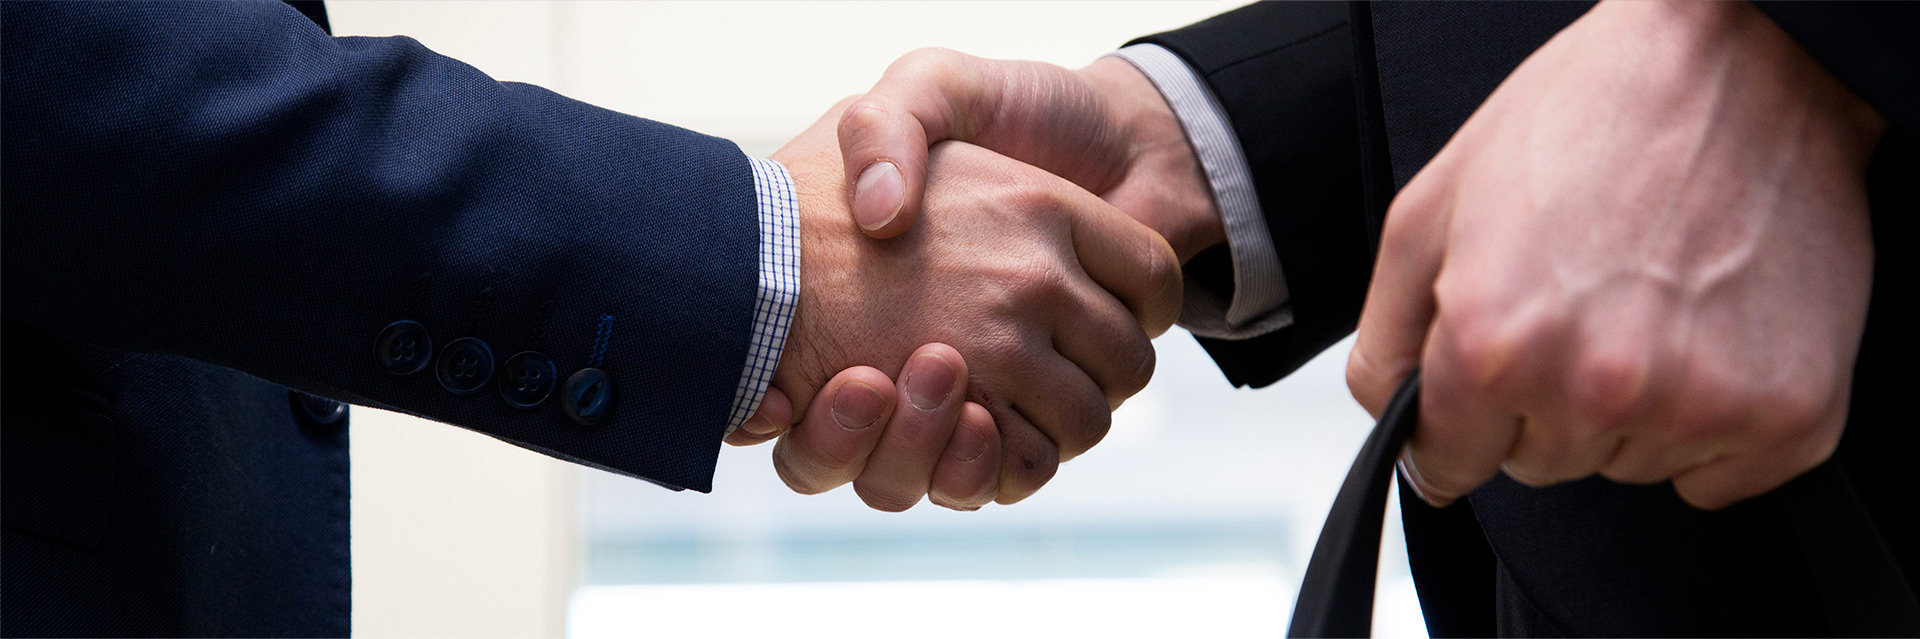 partenaires-adechotech-tele-medecine